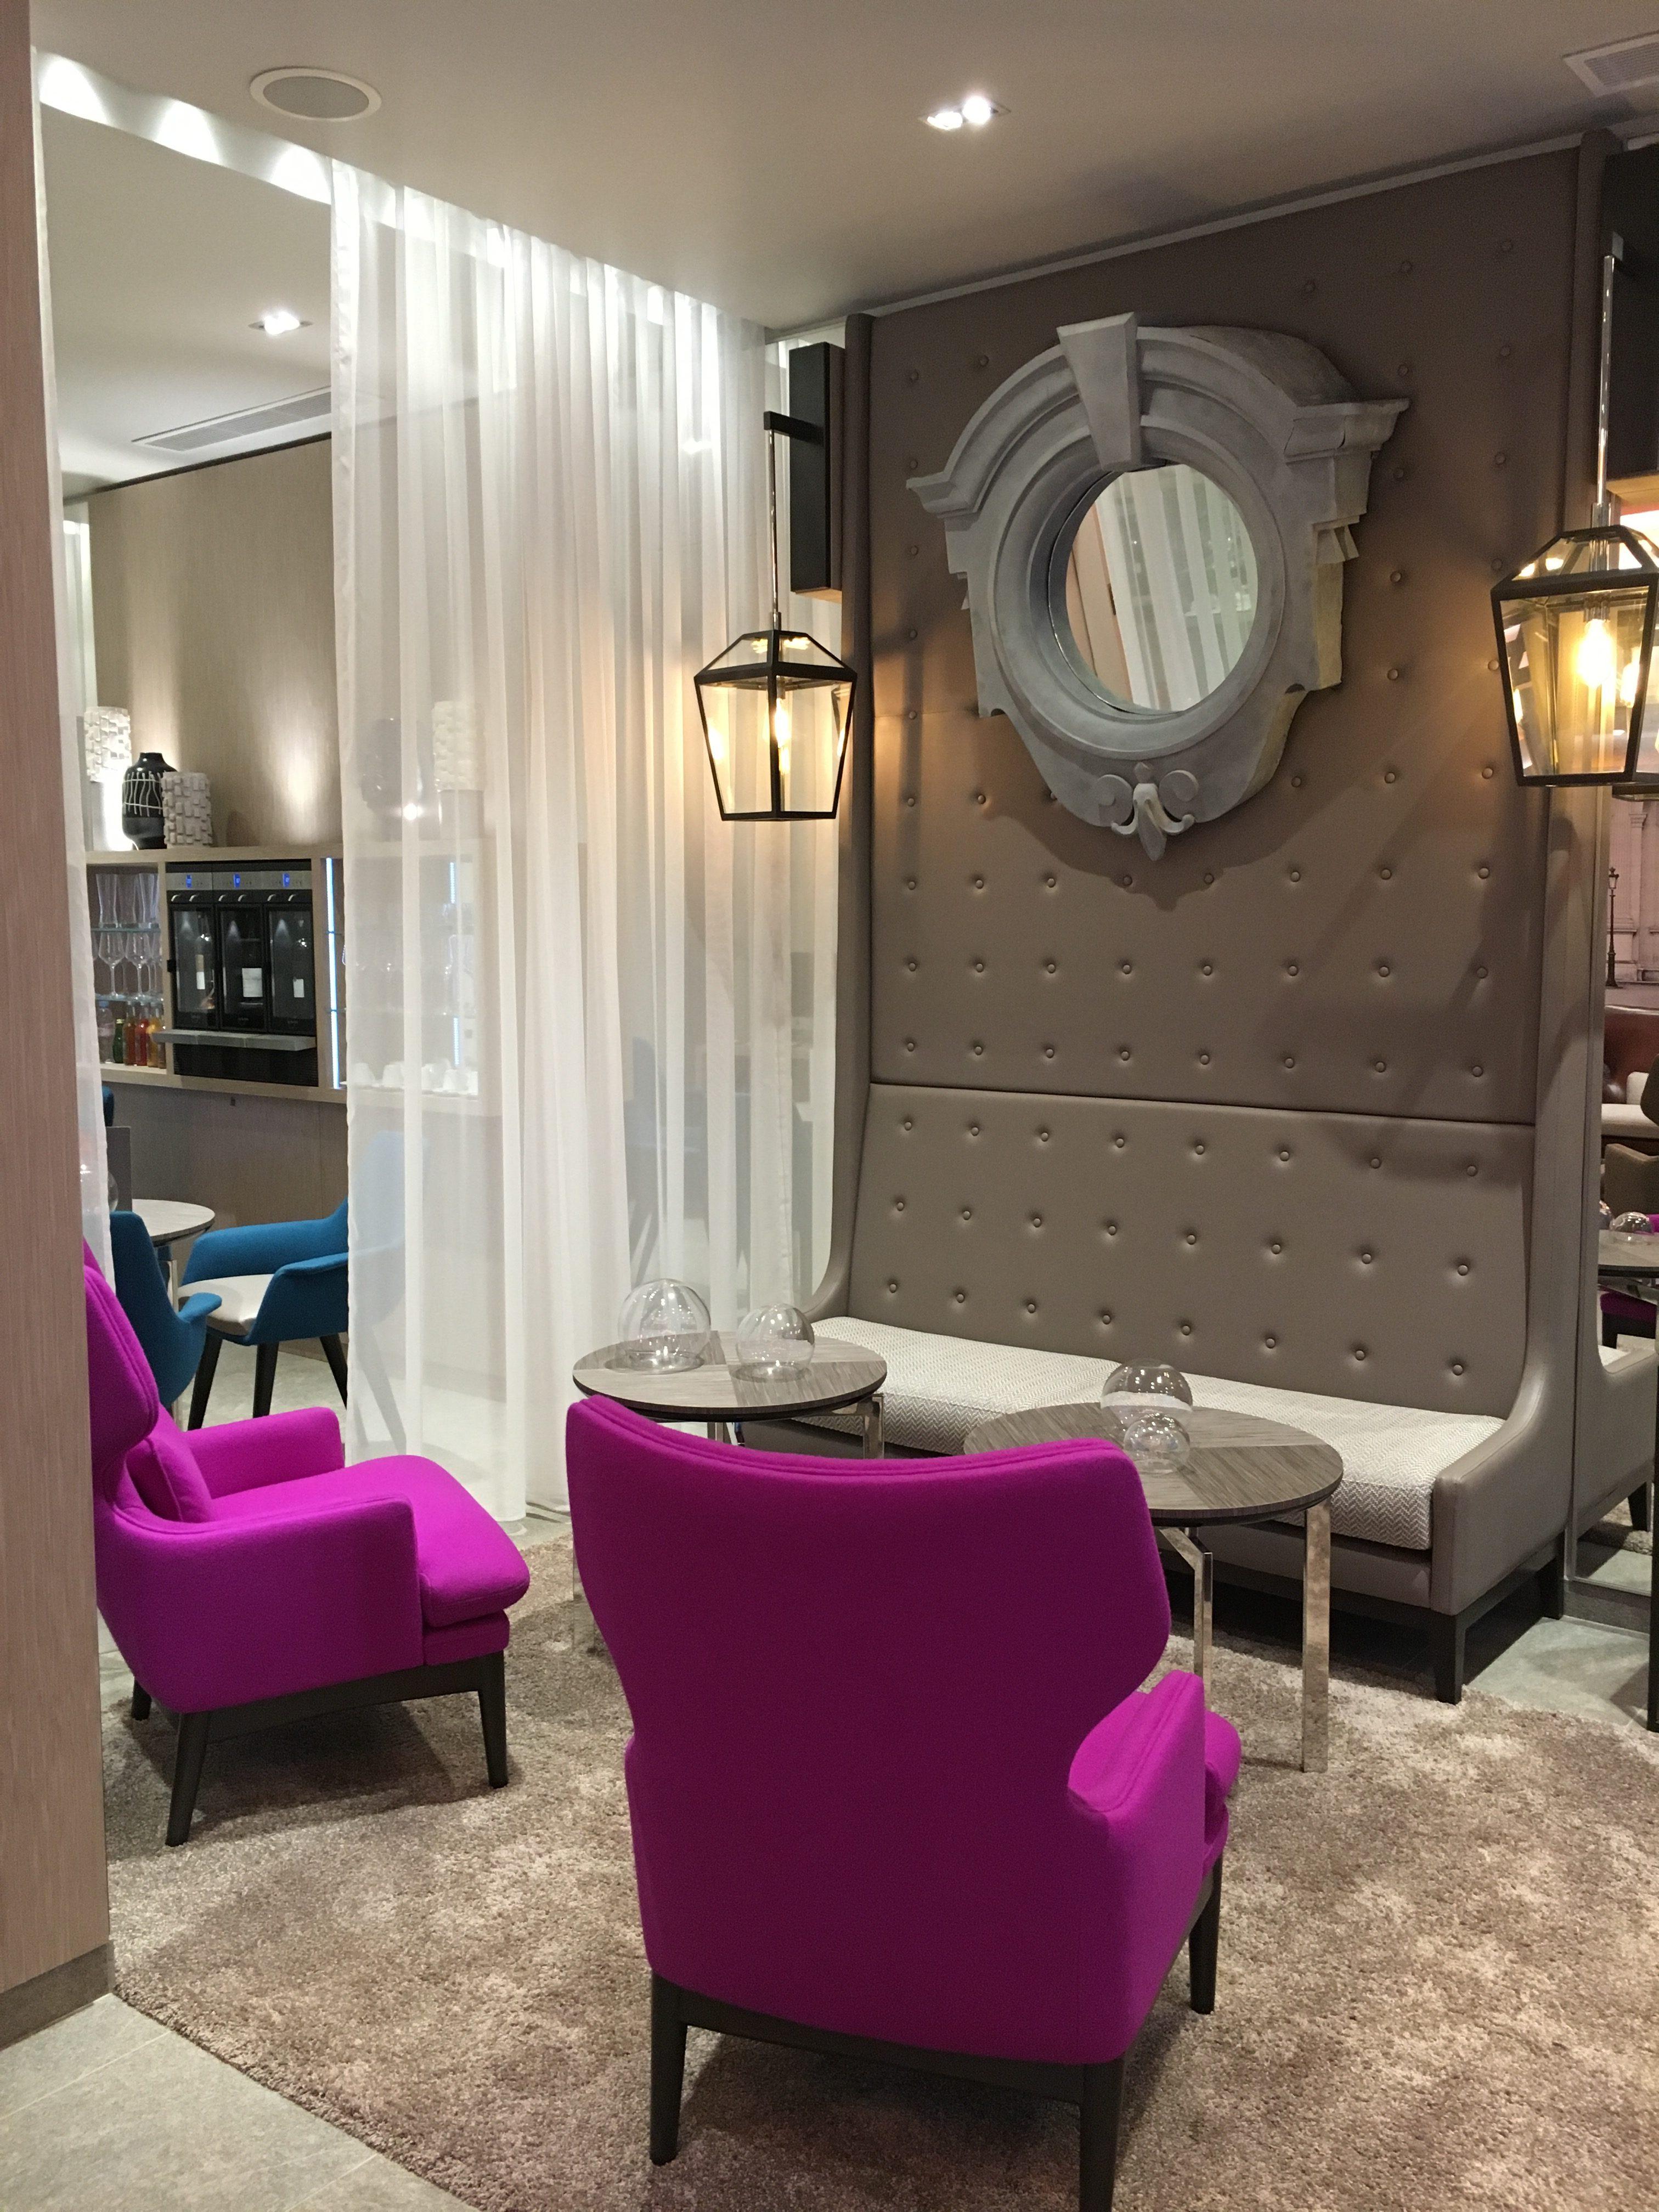 hotel la lanterne paris my daily stylebook. Black Bedroom Furniture Sets. Home Design Ideas